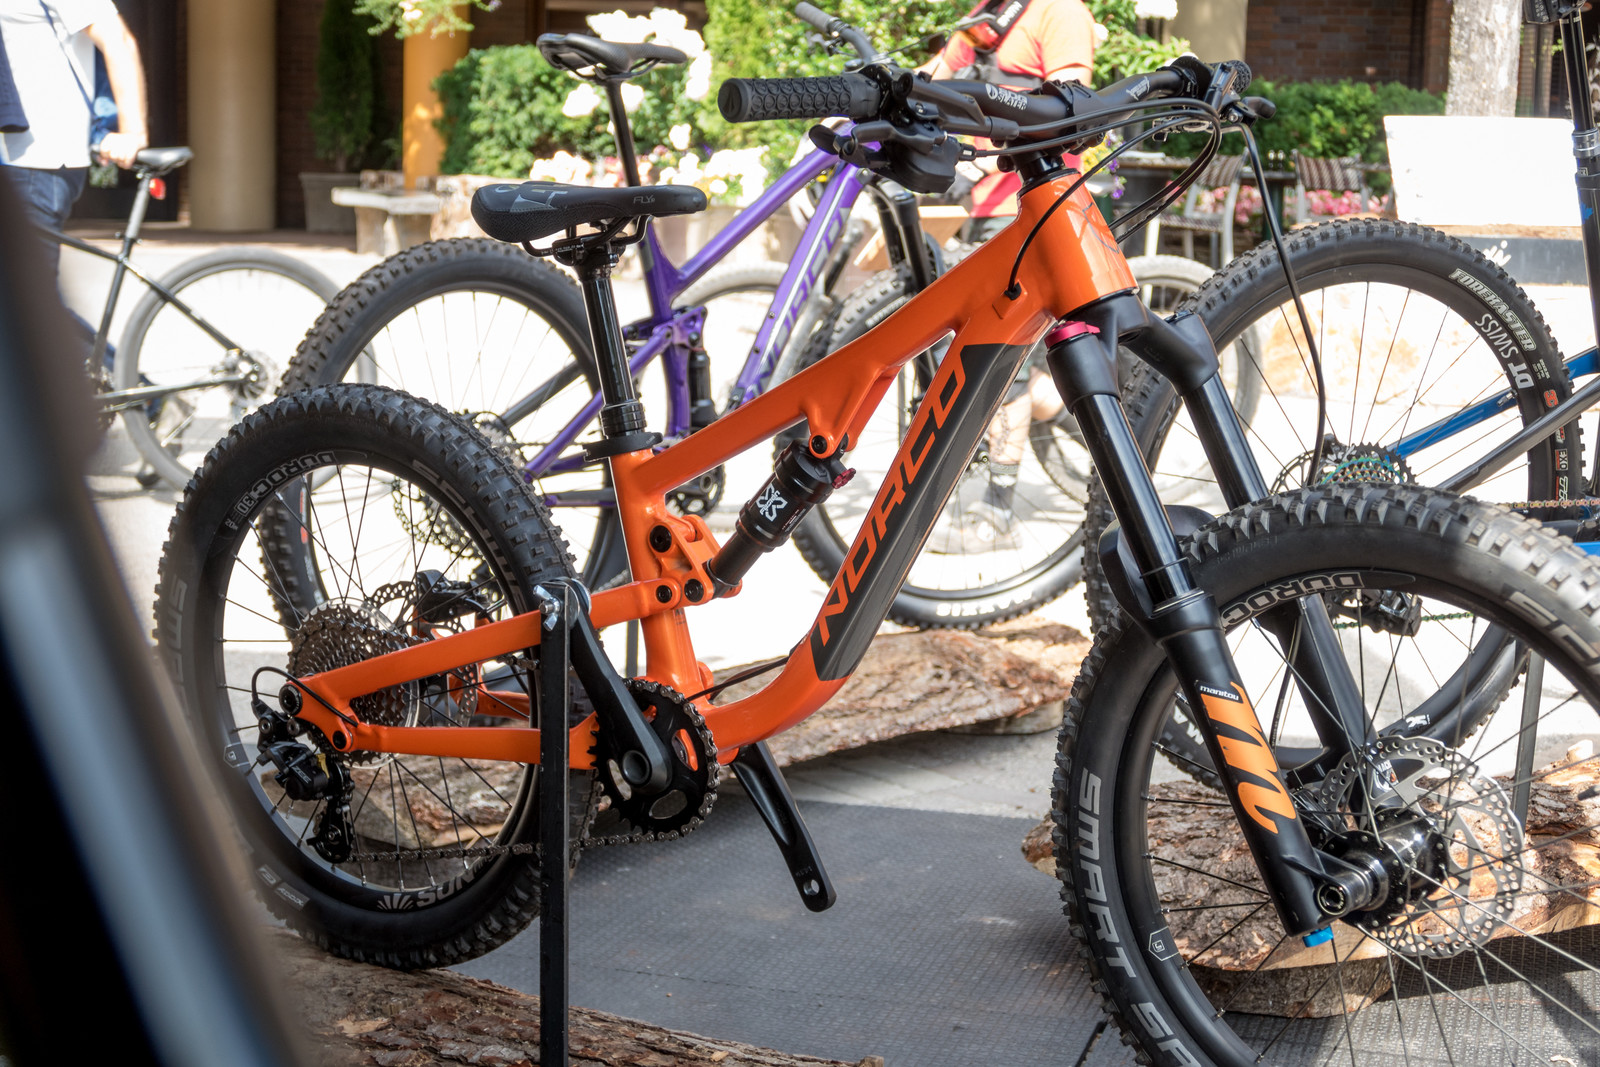 2020 Norco's Fluid FS Kids Bikes - PIT BITS - 2019 Crankworx Whistler Bikes and Tech - Mountain Biking Pictures - Vital MTB